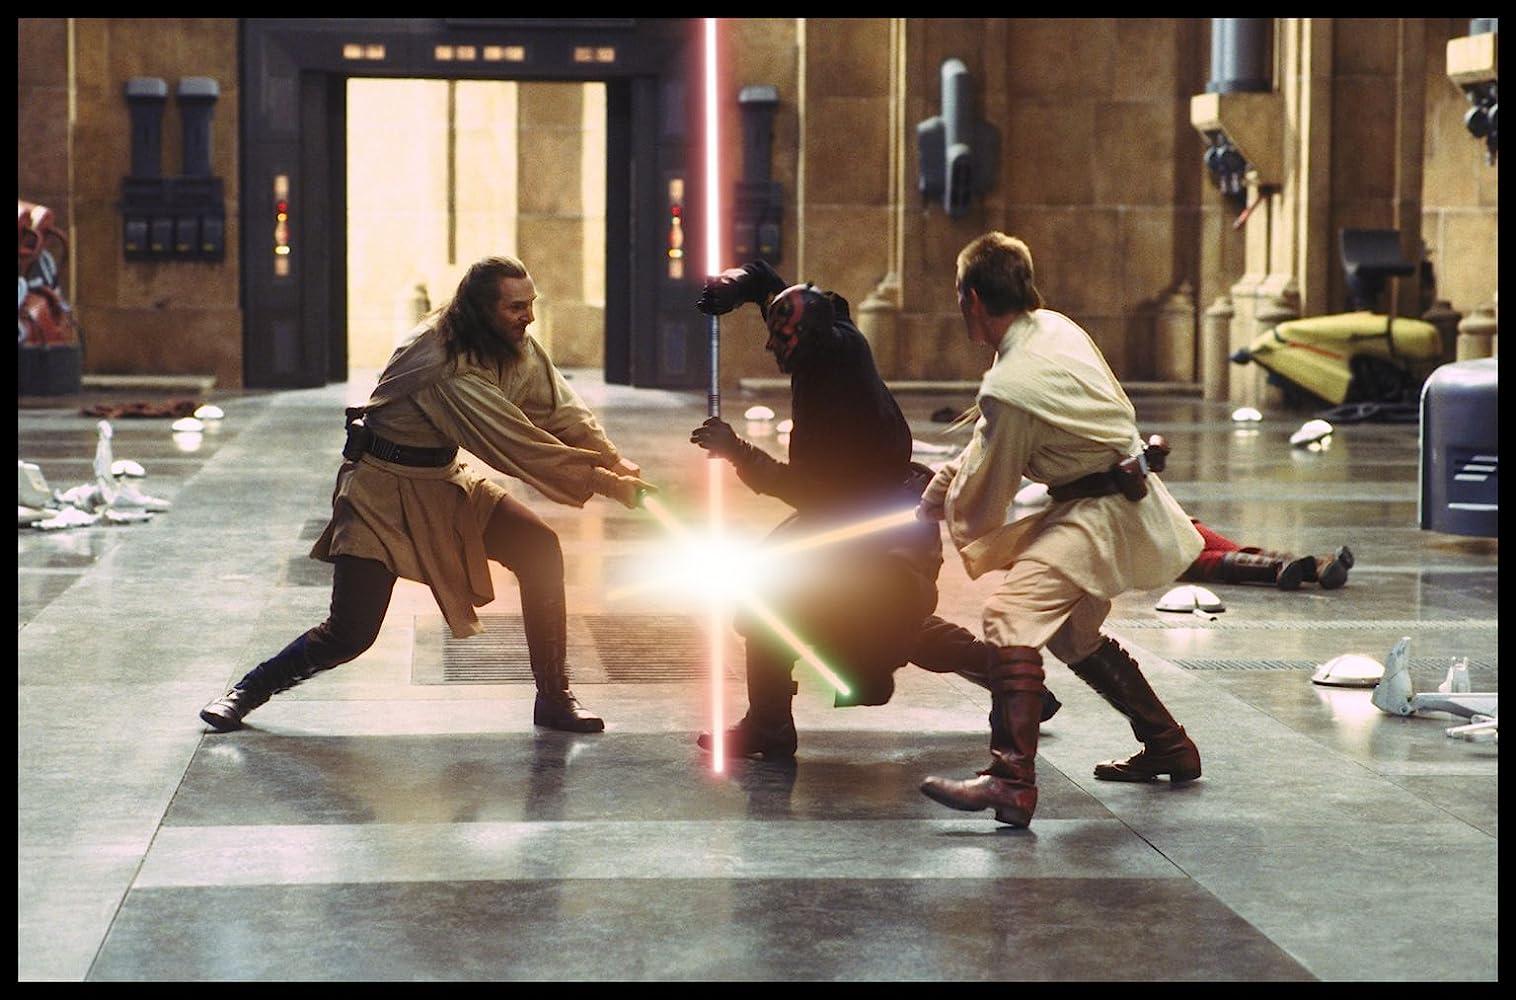 Ewan McGregor, Liam Neeson, and Ray Park in Star Wars: Episode I - The Phantom Menace (1999)